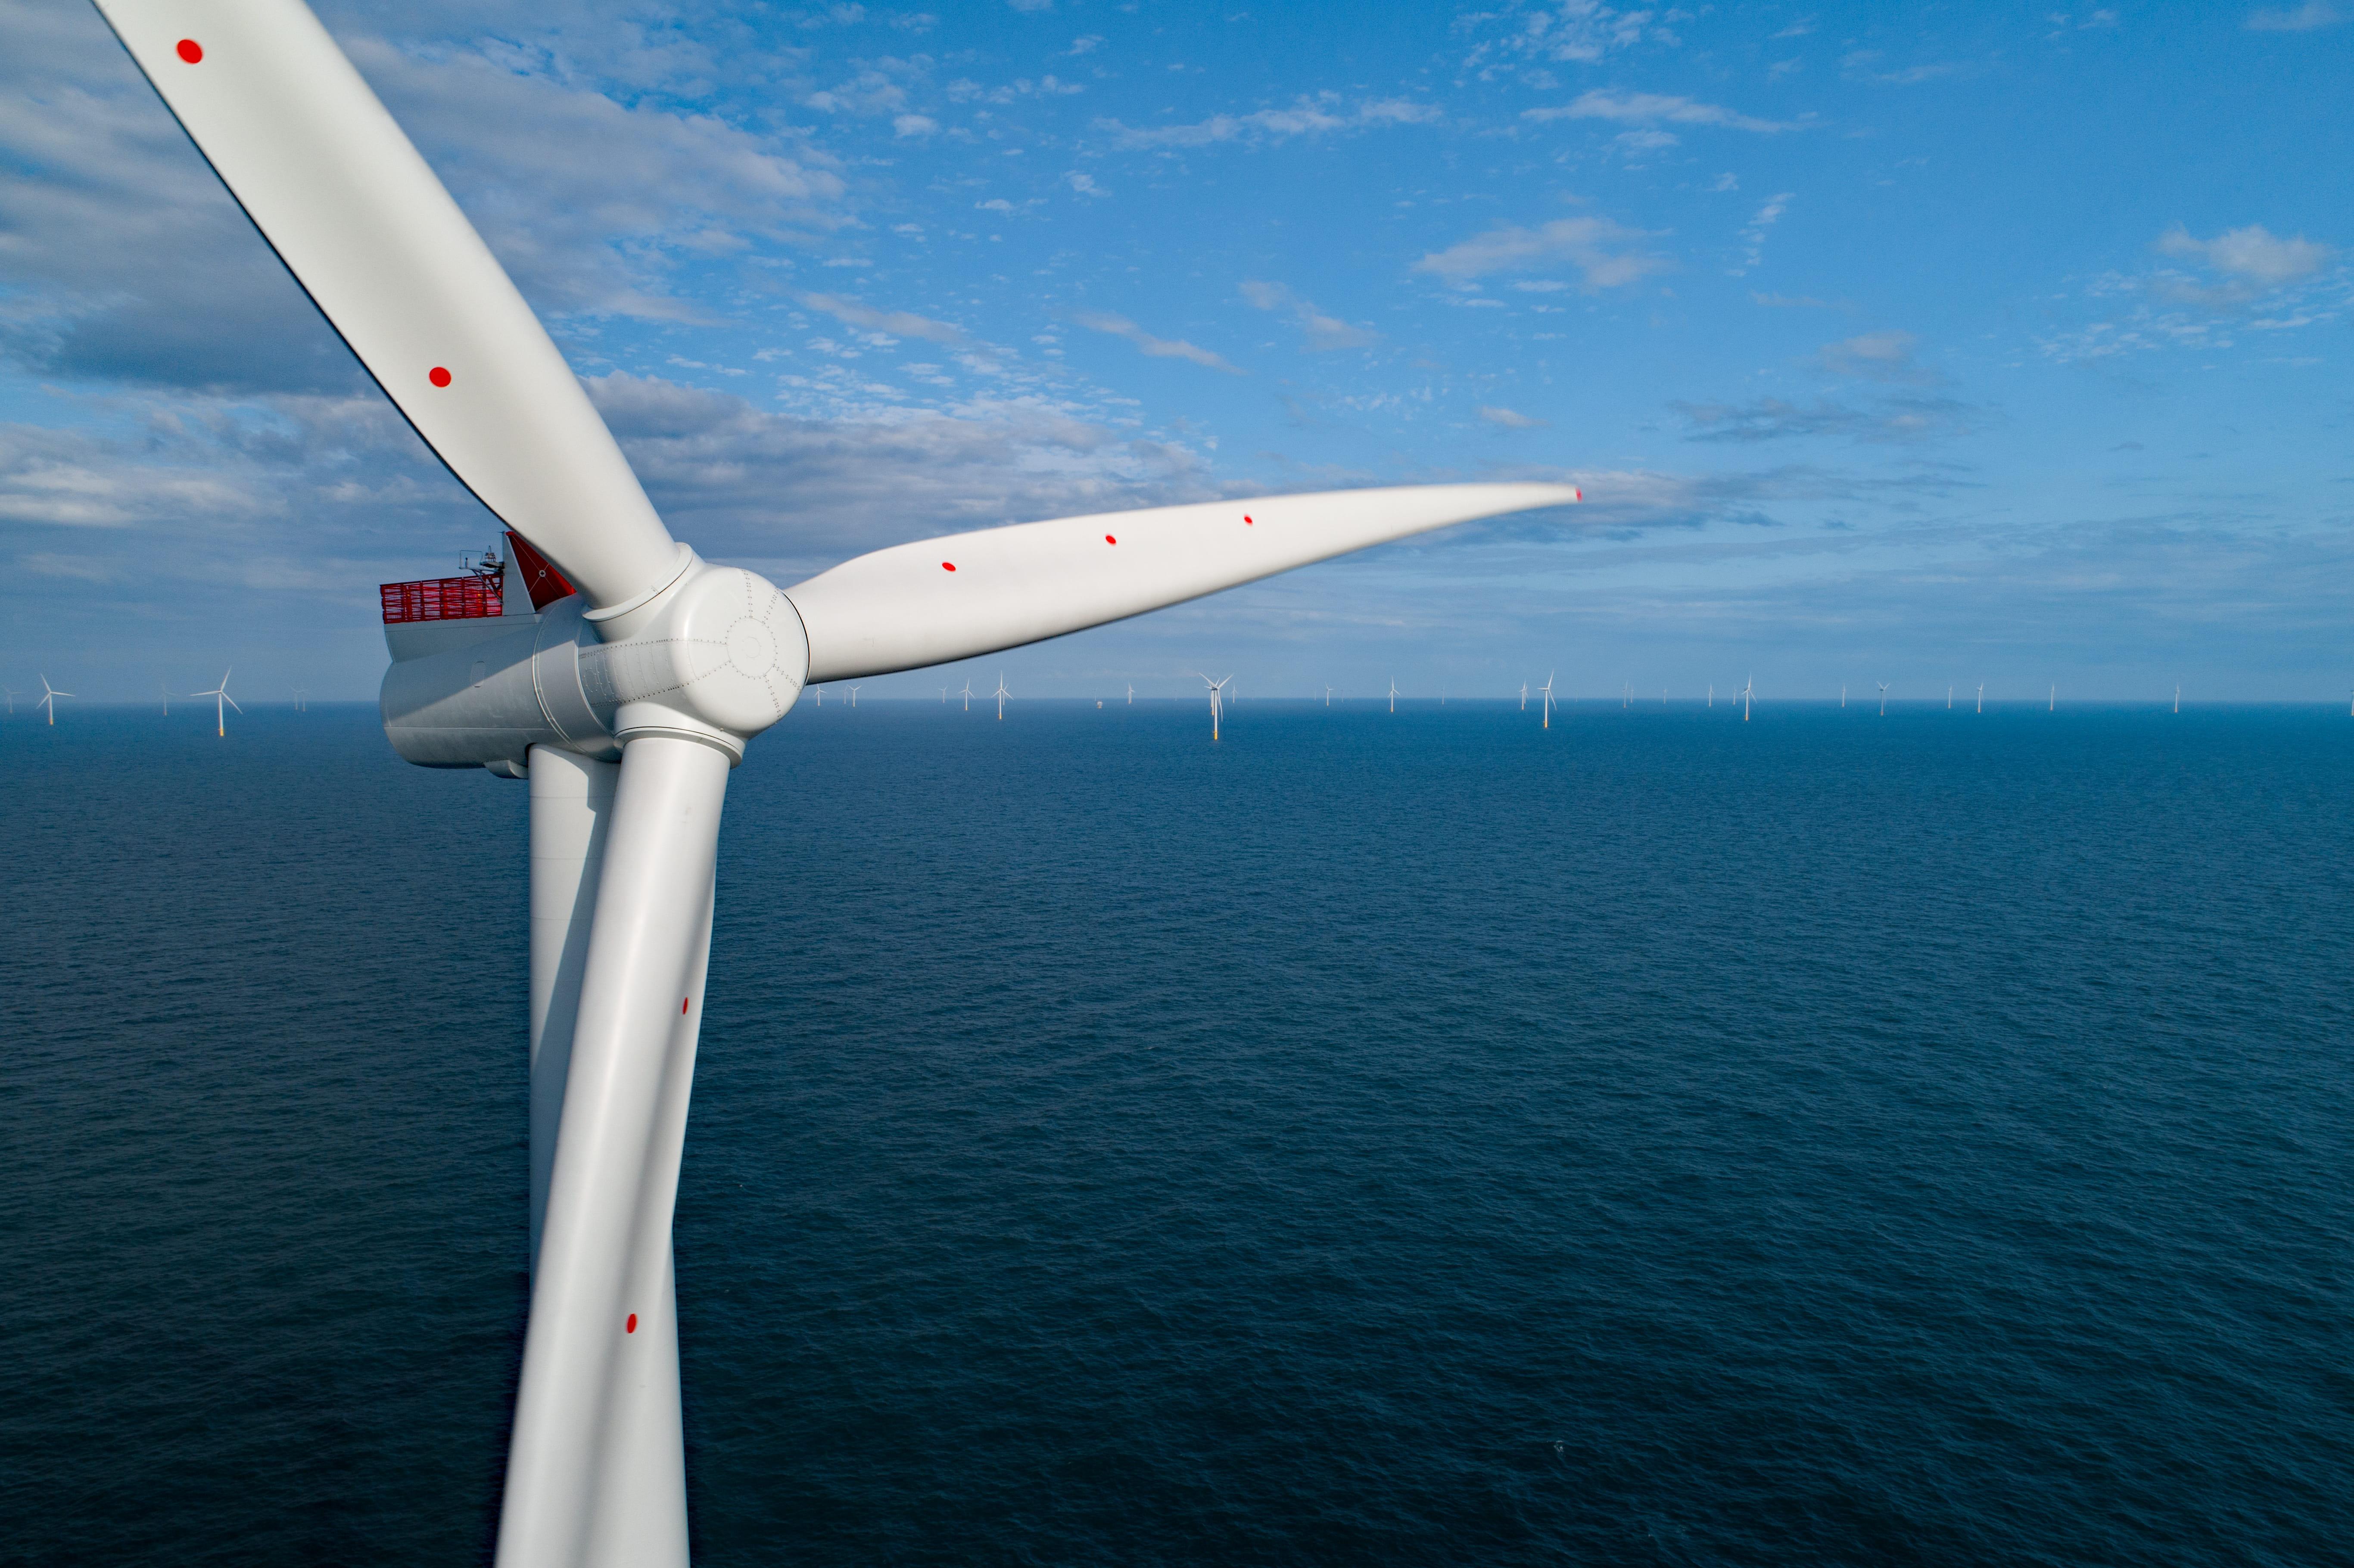 Hornsea One Offshore Wind Farm turbine